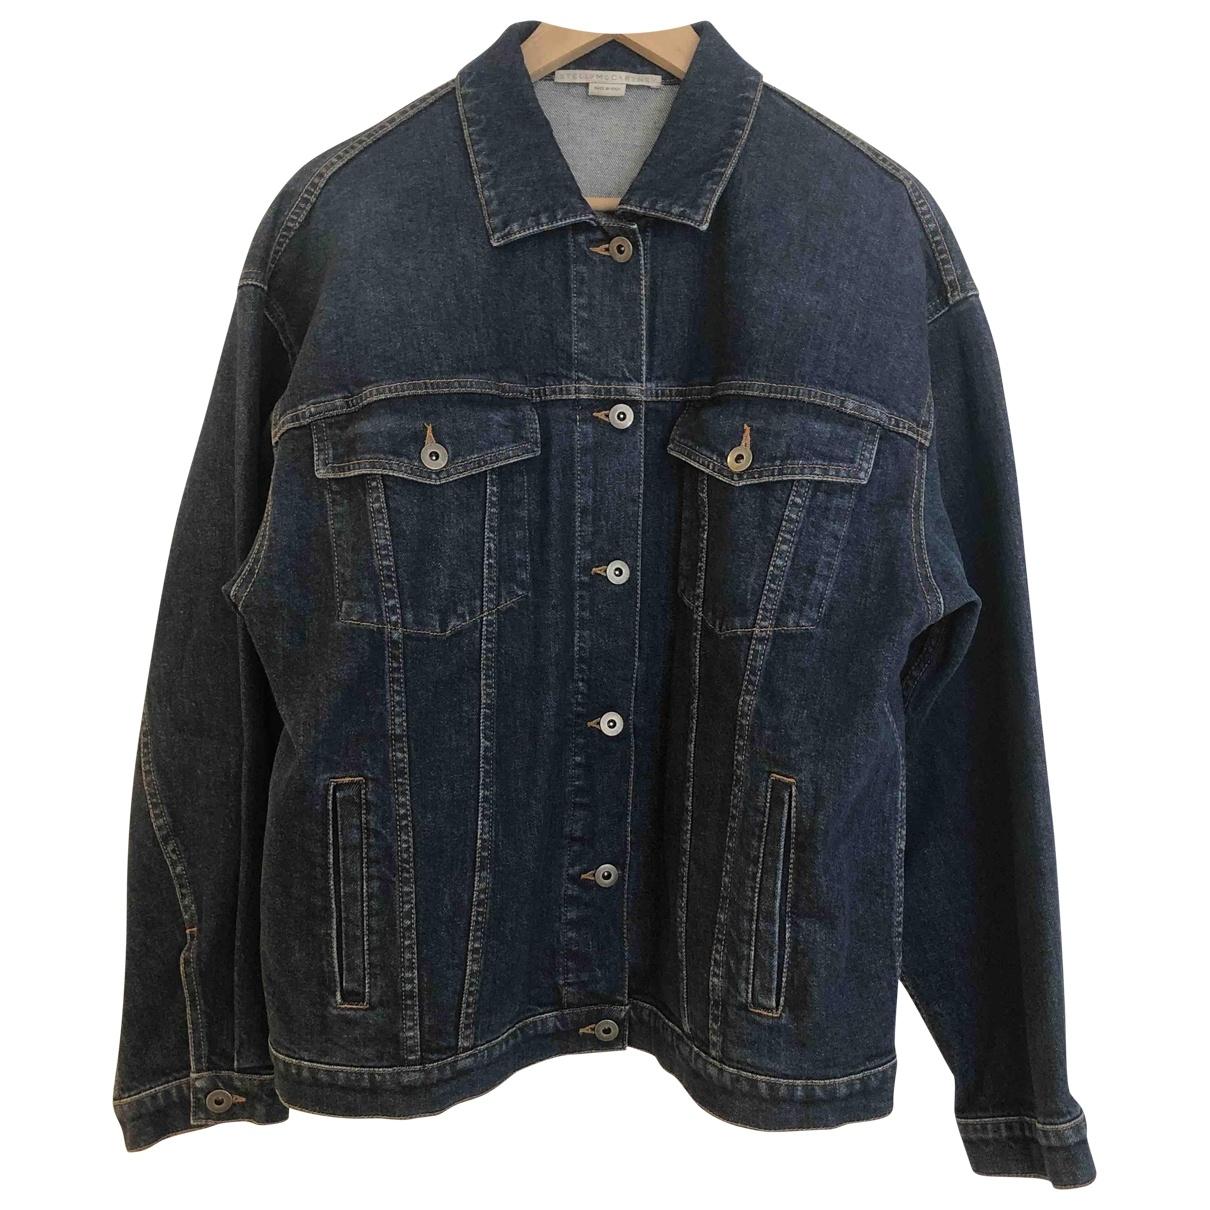 Stella Mccartney \N Jacke in  Blau Denim - Jeans